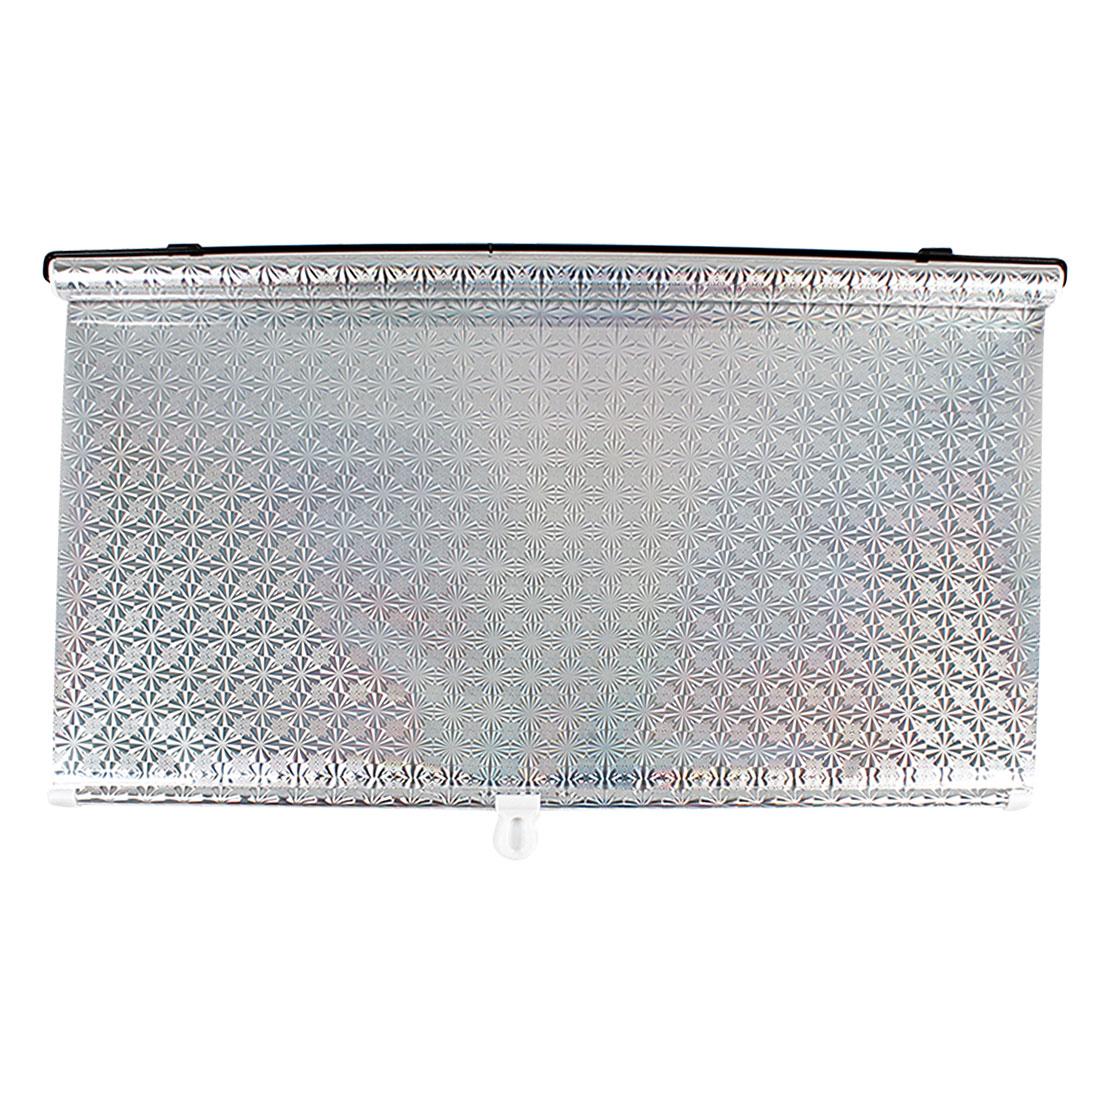 125cm x 68cm Silver Tone Vinly Reflective Sunshade Sun Shield for Car